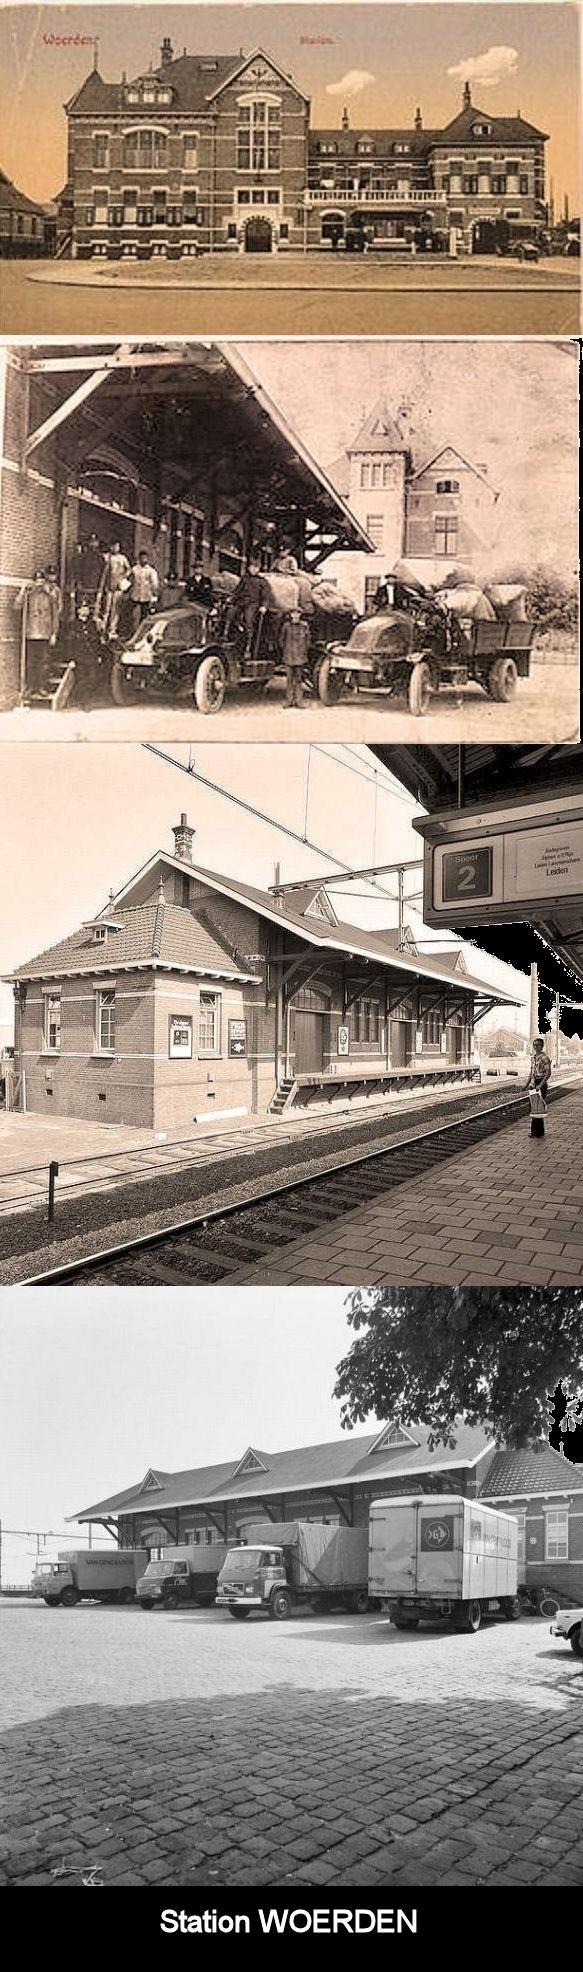 Woerden station.jpg